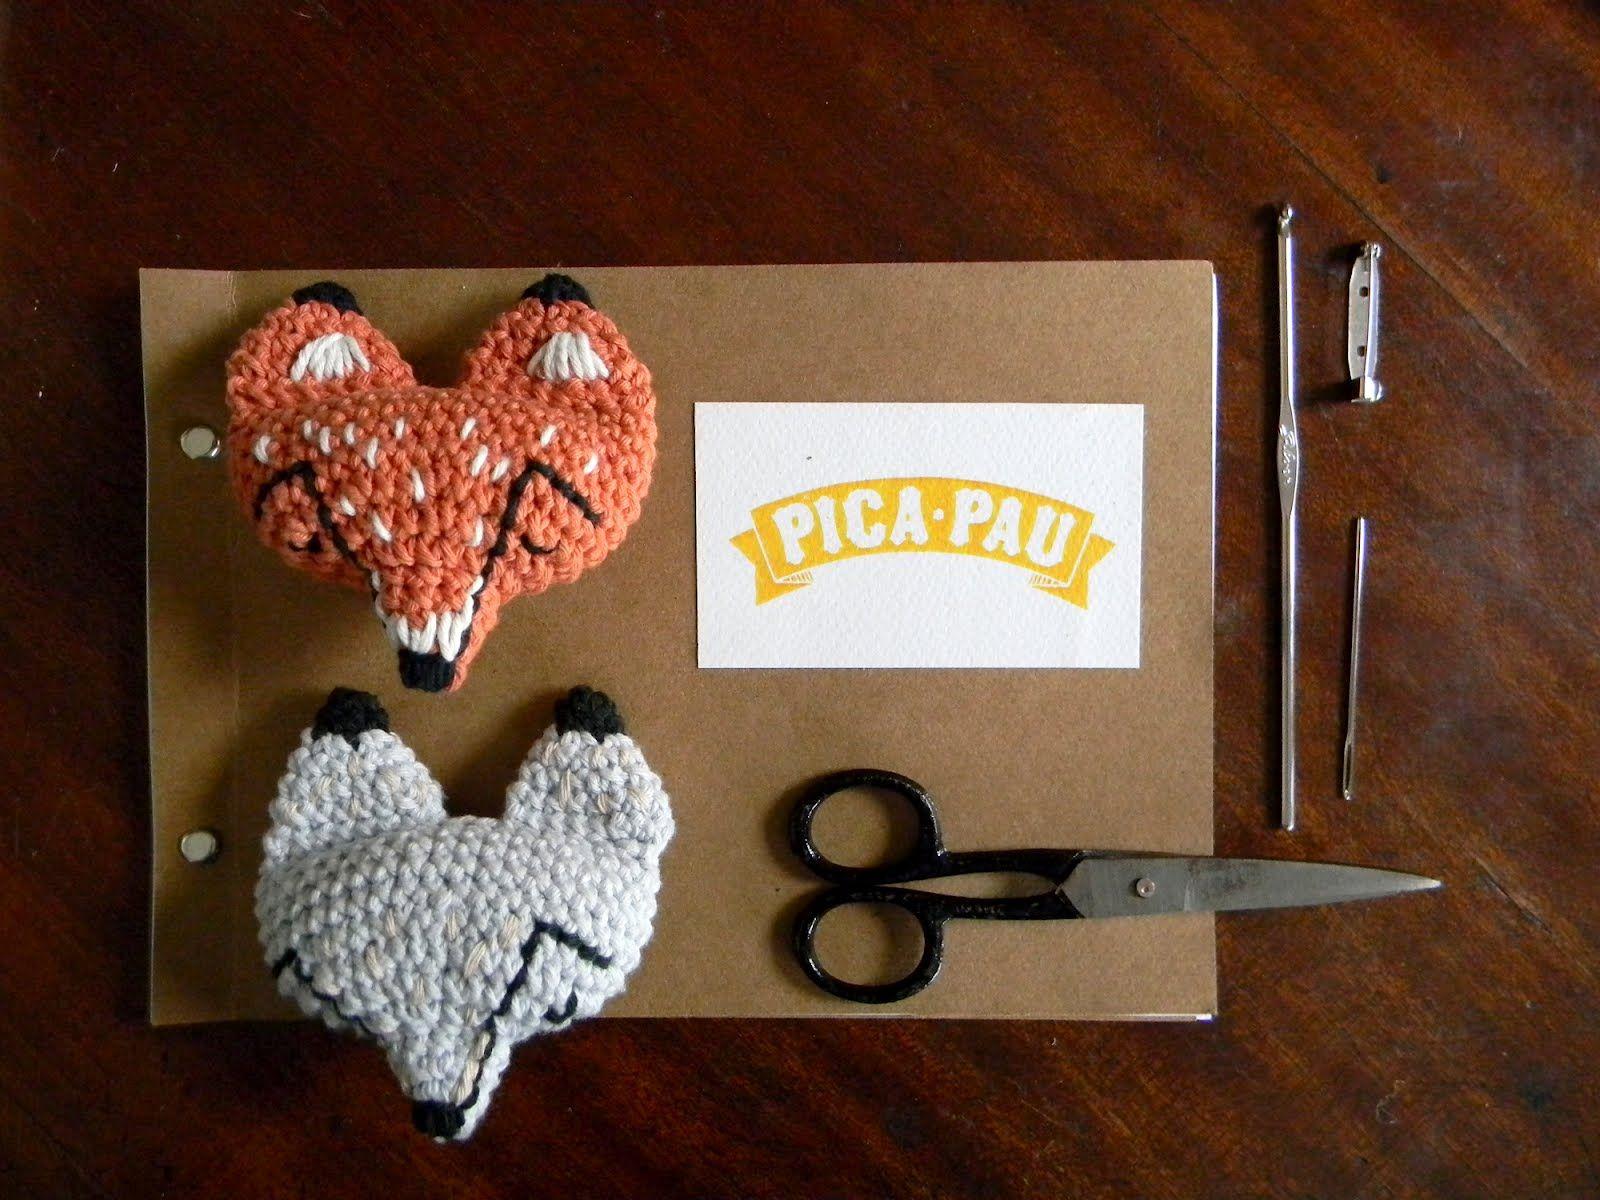 pica-pau: pin pattern fox / fox pin pattern | Yarn | Pinterest ...